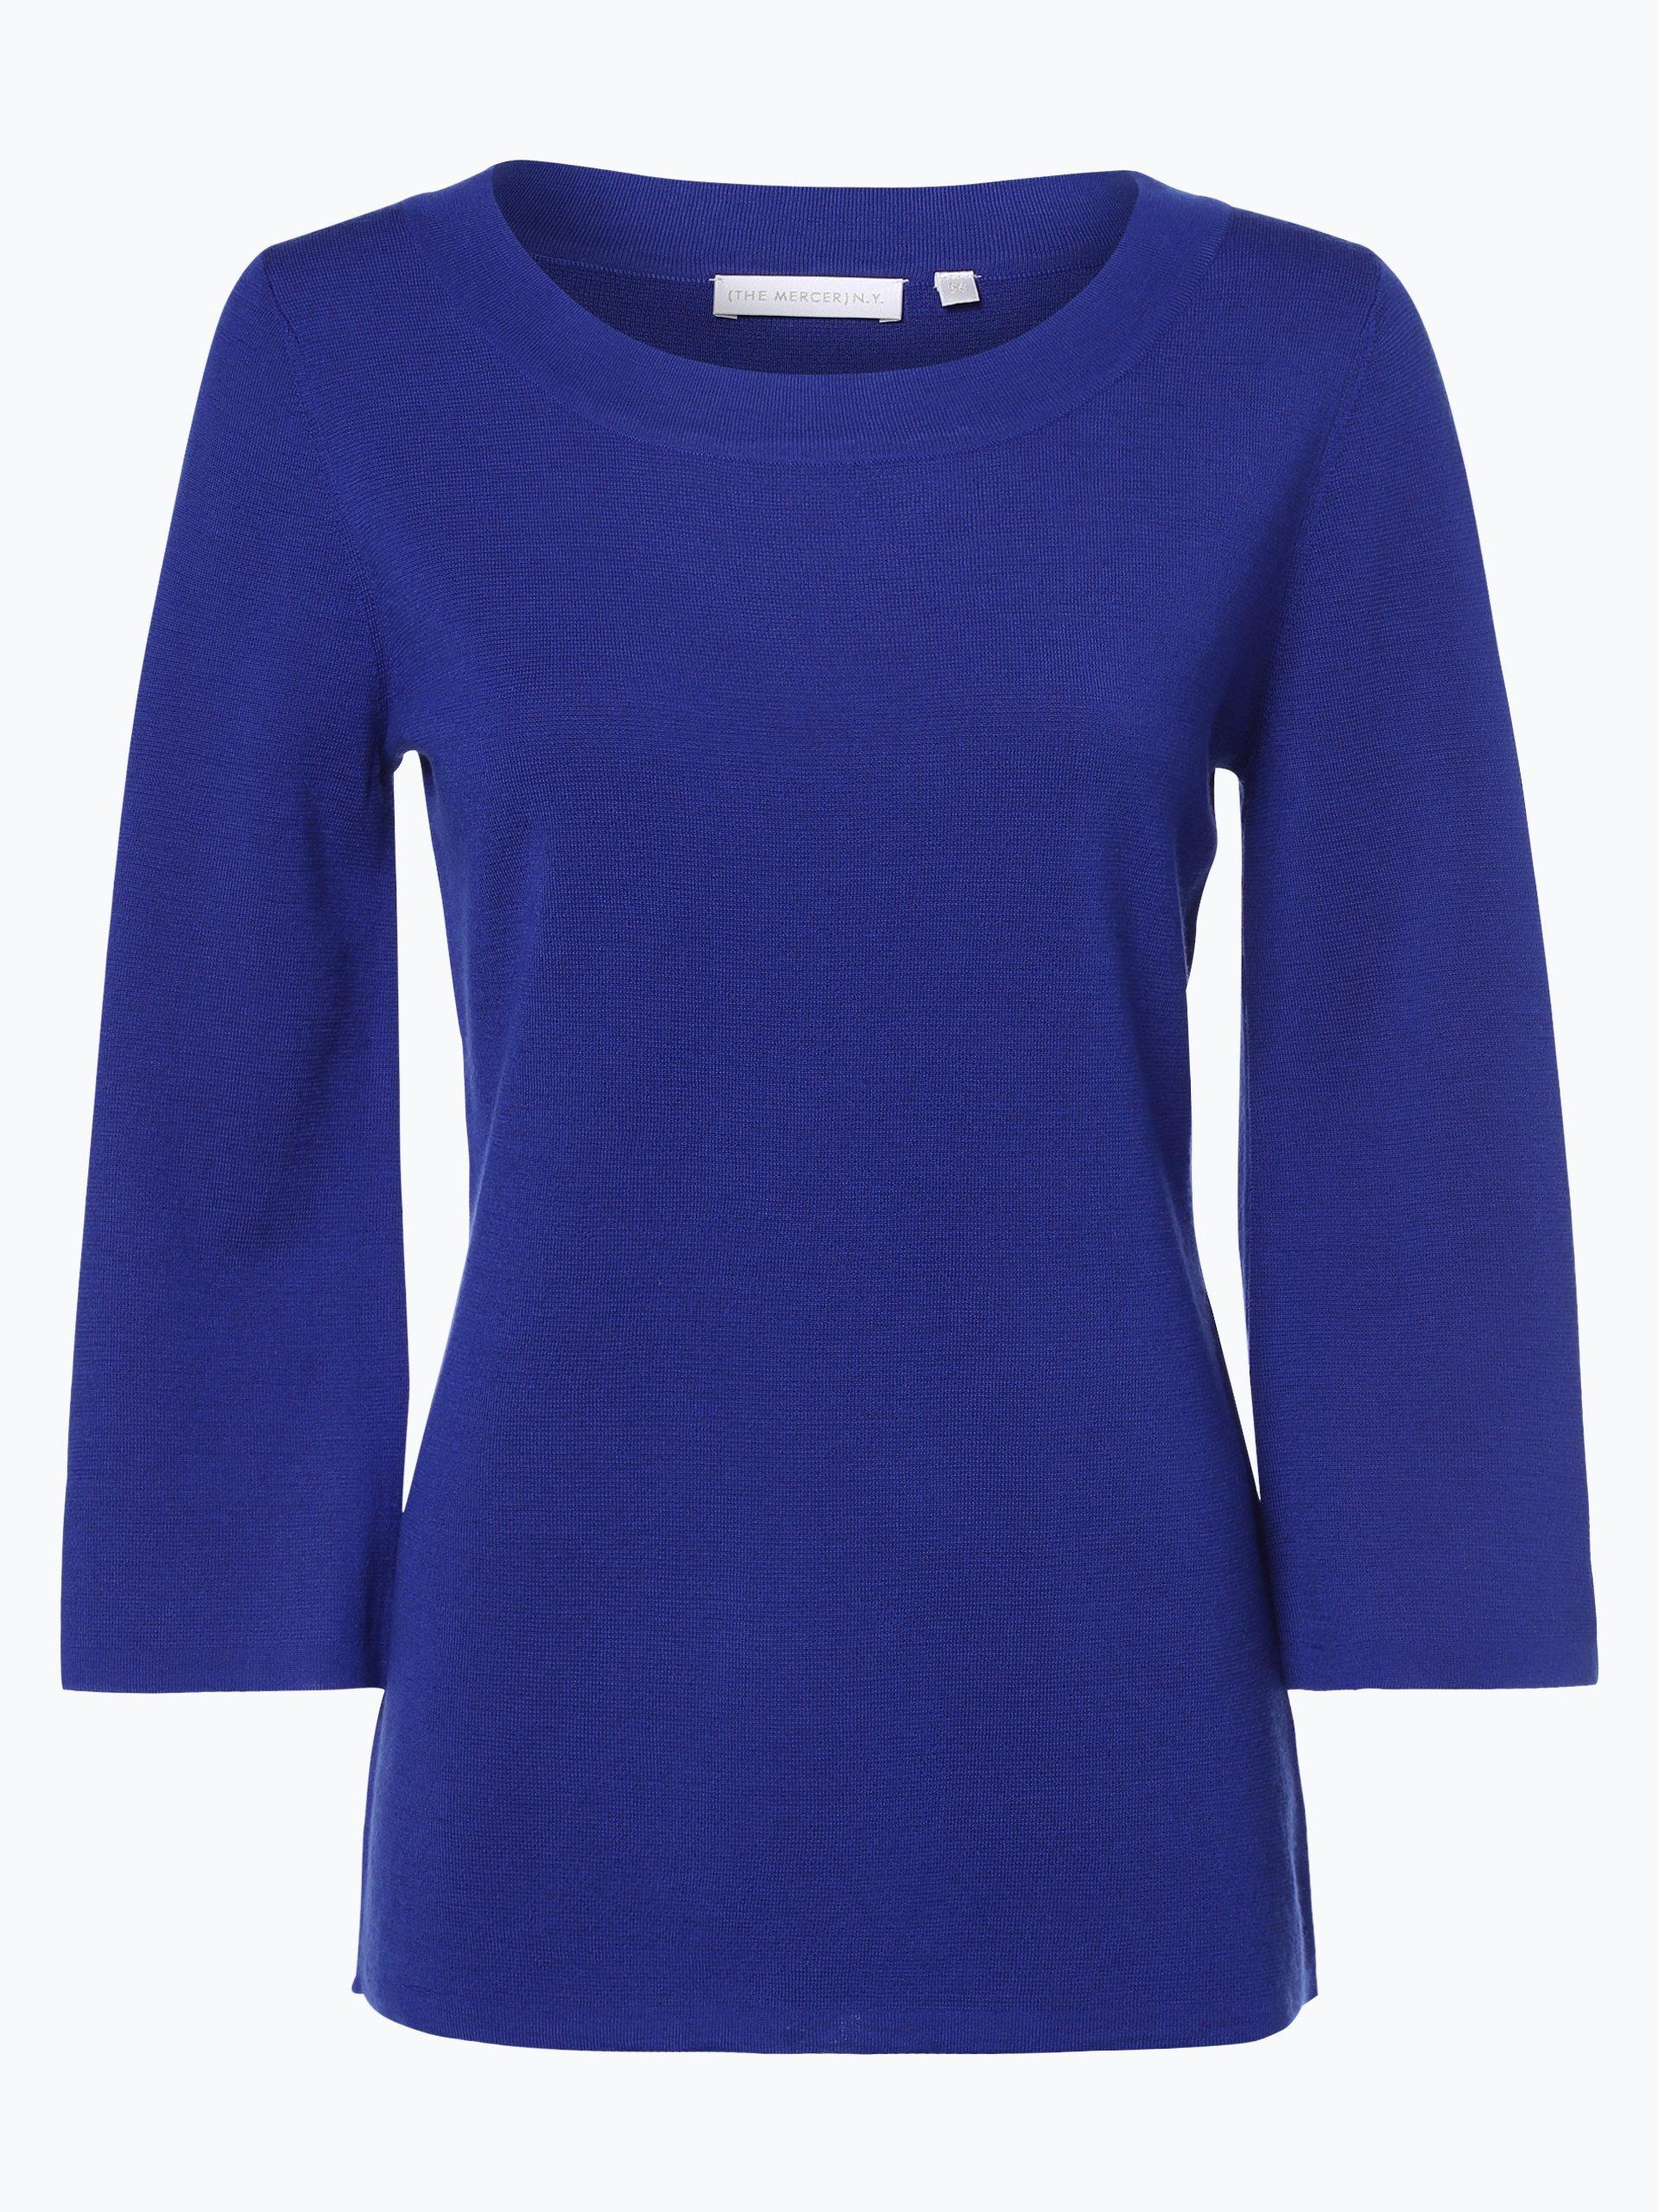 (THE MERCER) N.Y. Damen Pullover